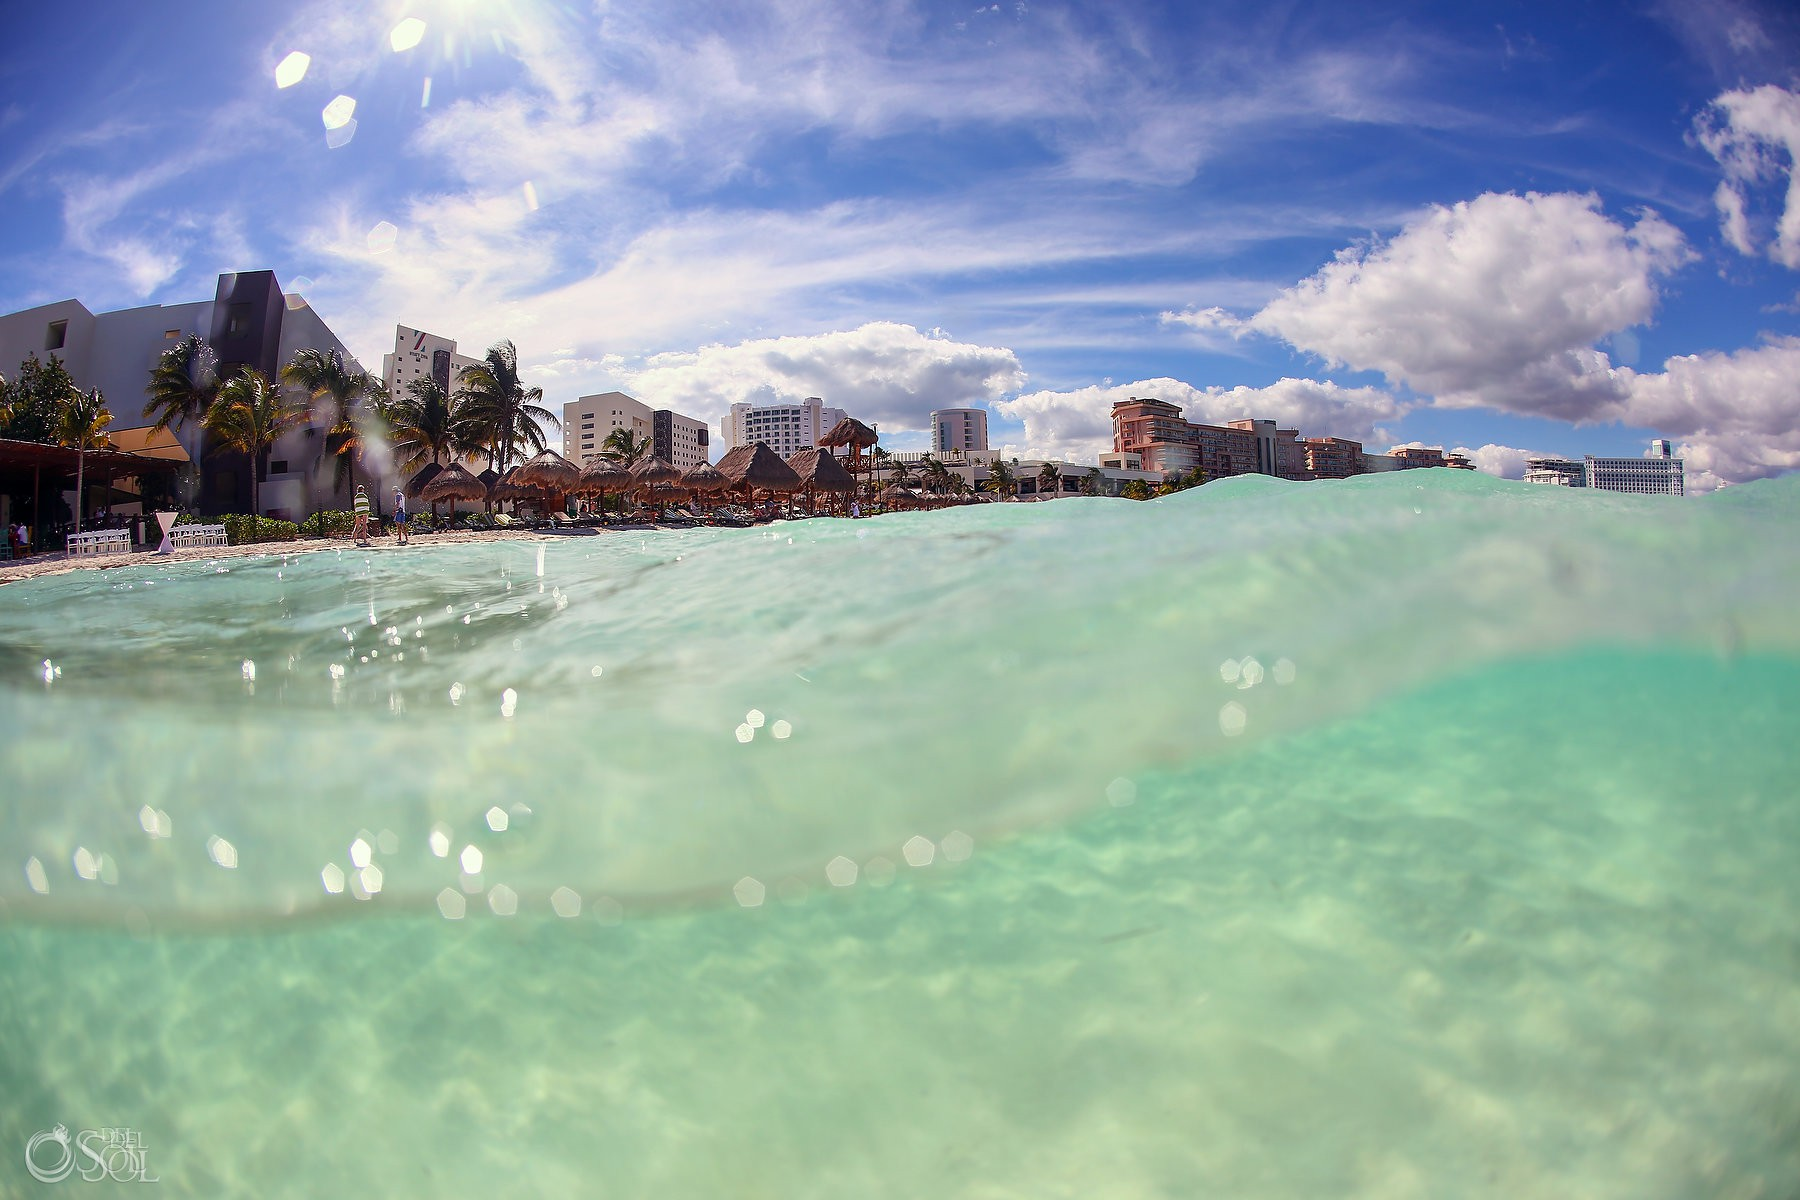 Amazing caribbean ocean perfect for destination weddings at Hyatt Ziva Cancun